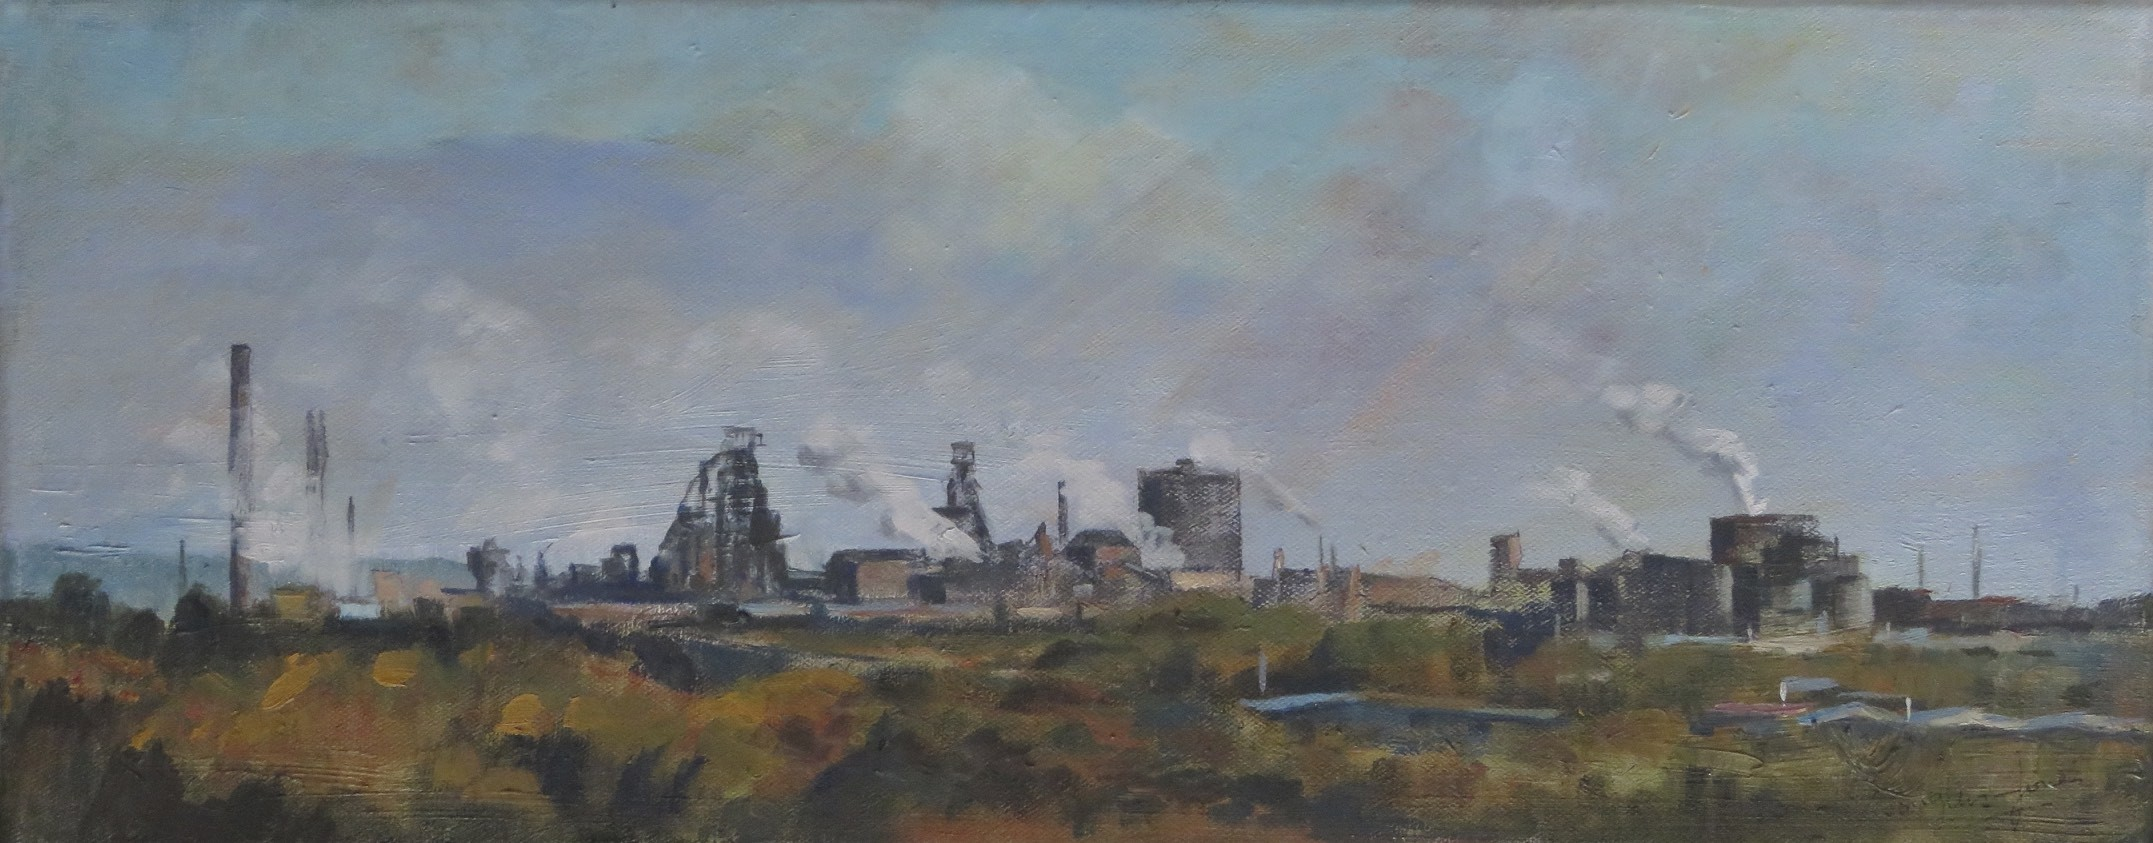 Port Talbot Panorama     20 x 45 cm   Watercolour